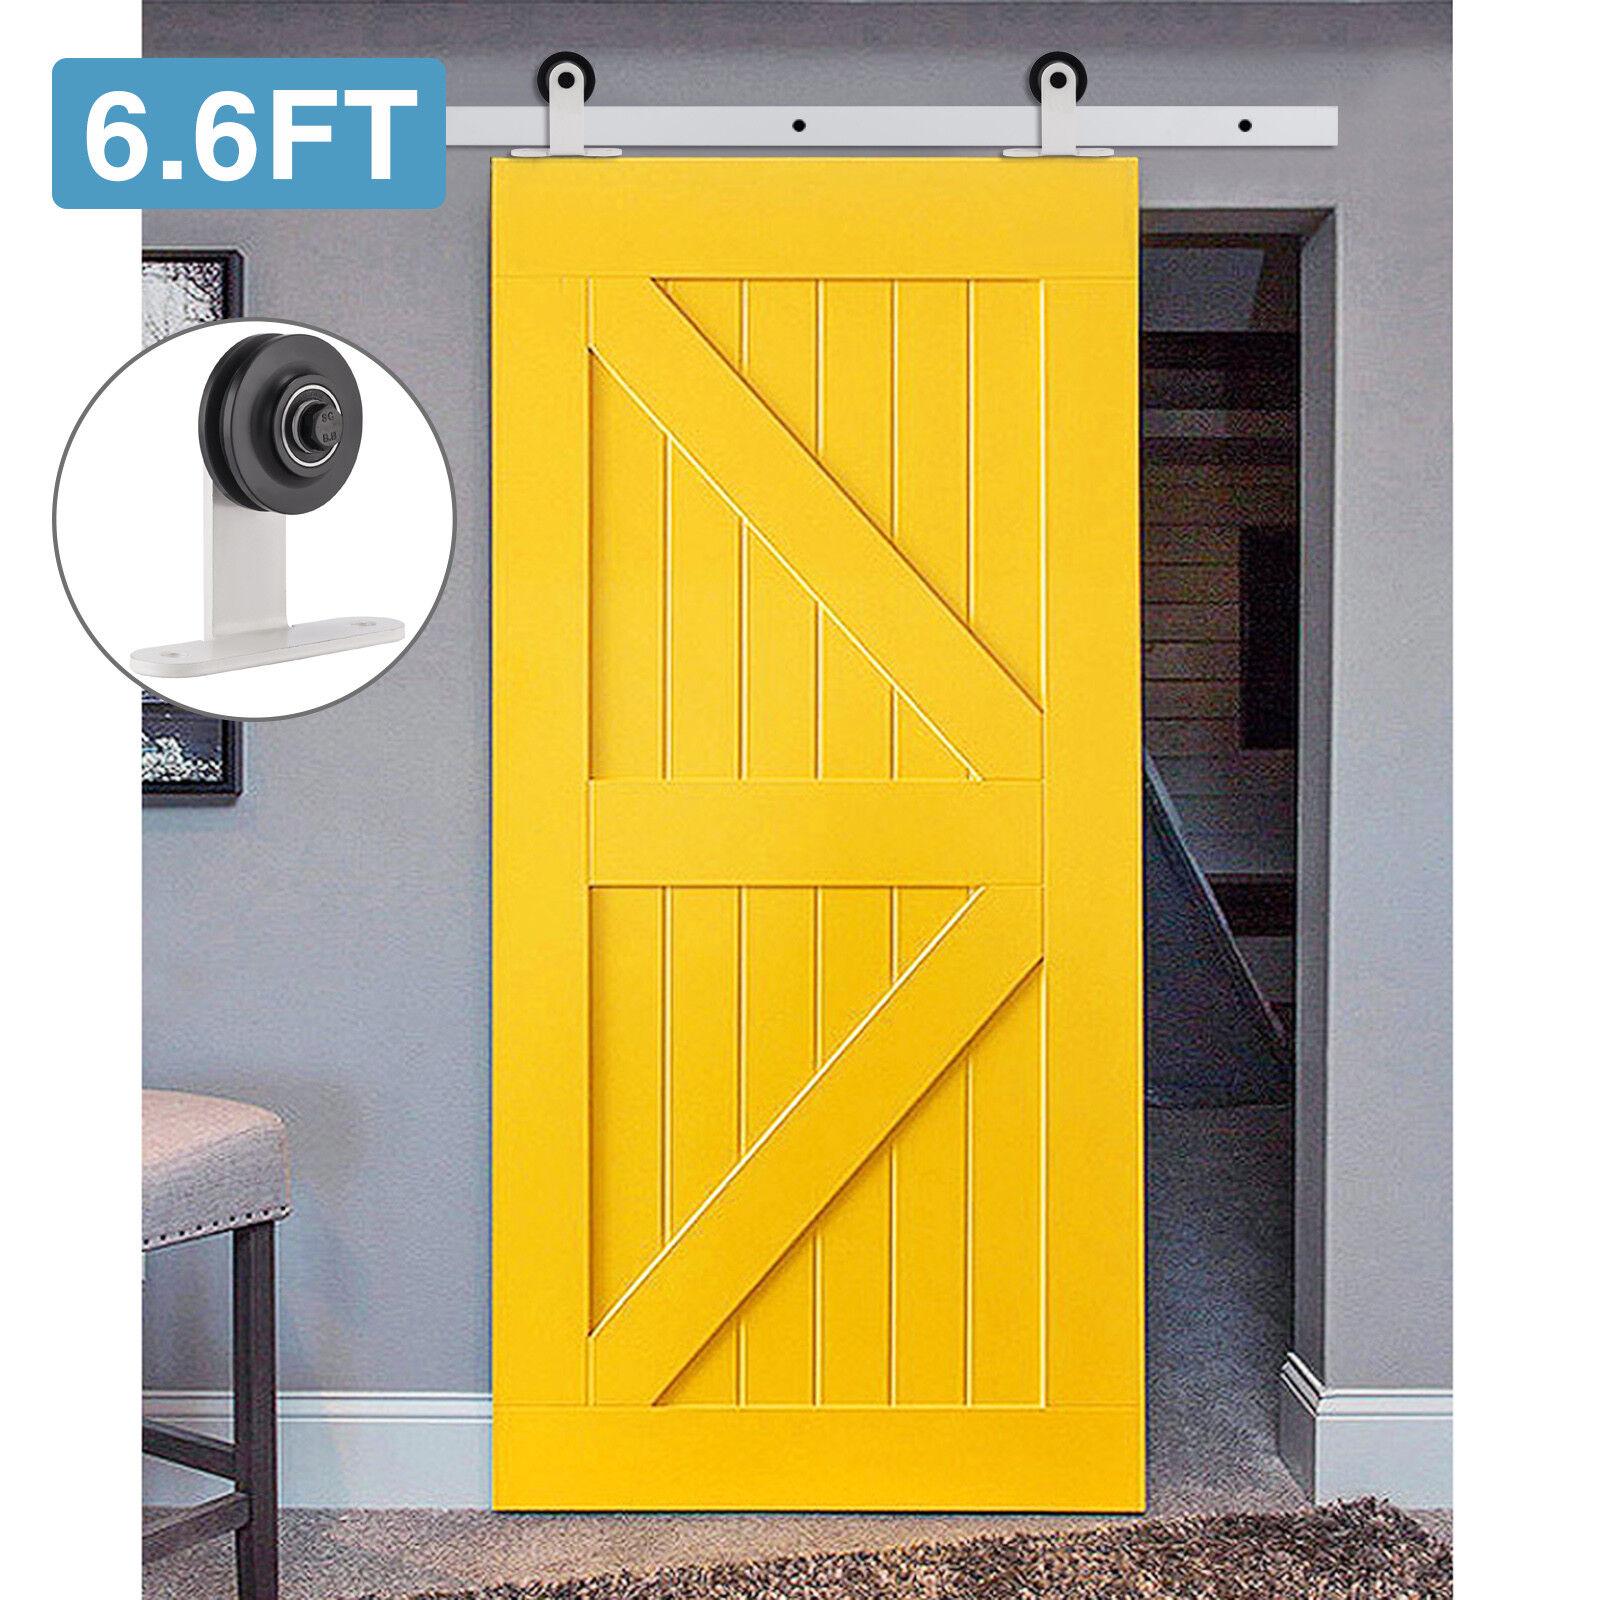 2FT-10.8FT Sliding Barn Wood Door Hardware Closet Kit Single/Double/Bypass Doors